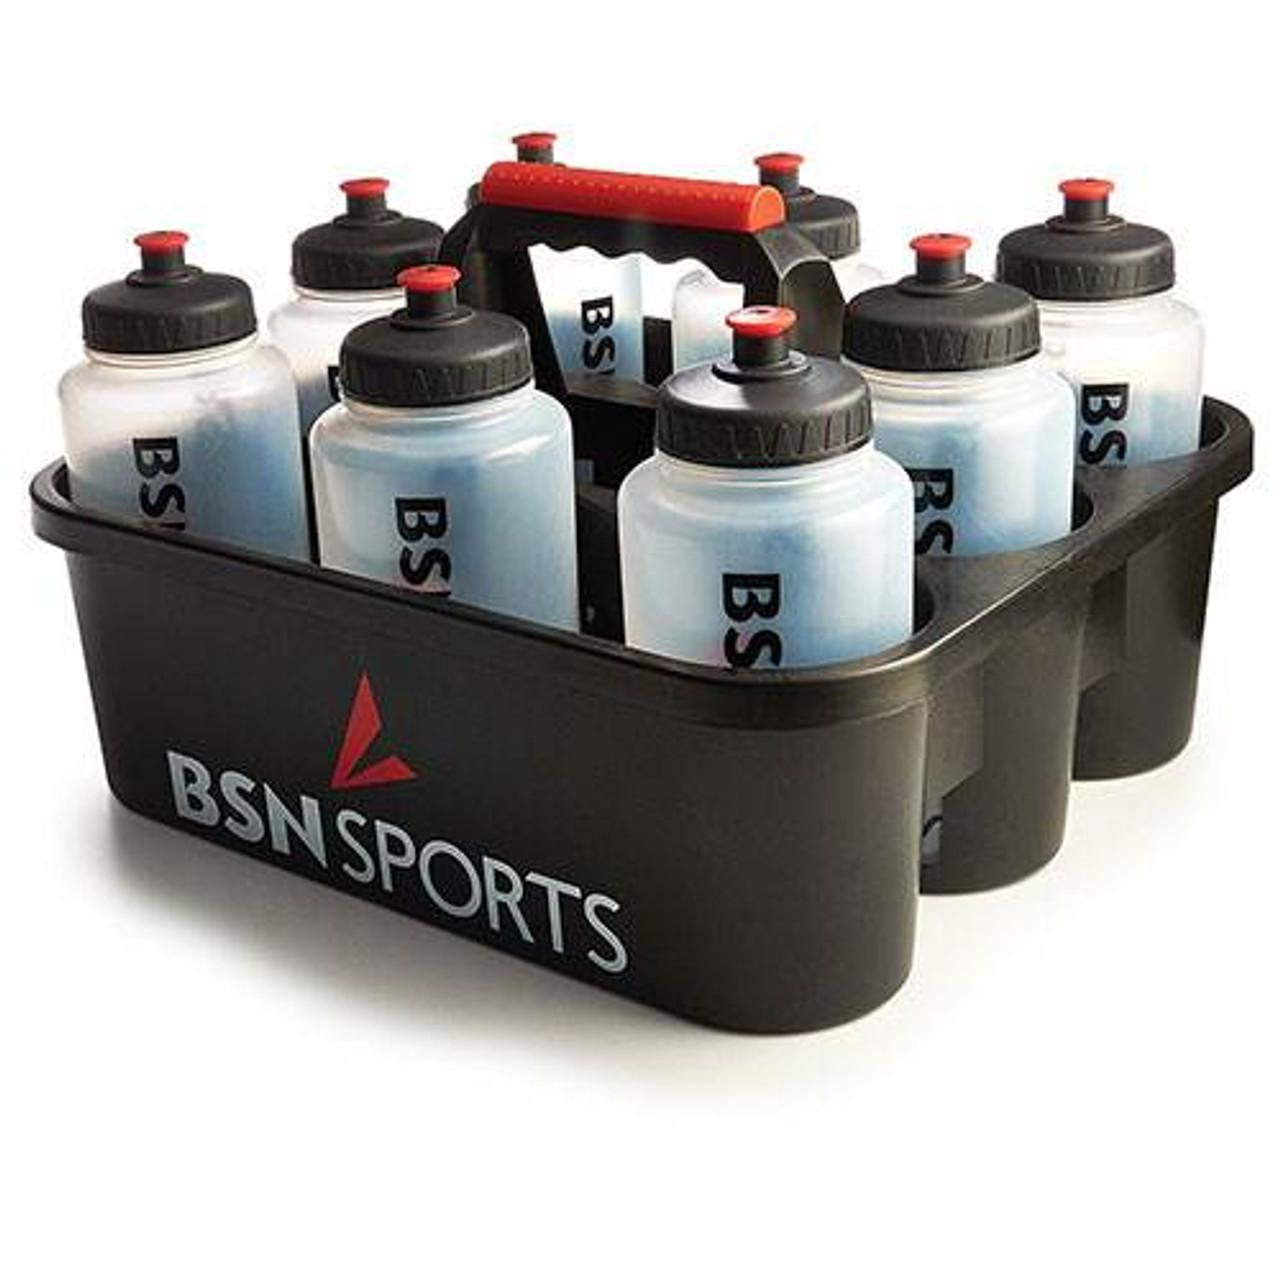 BSN SPORTS Bottle Carrier w/ 8 Qt Bottles